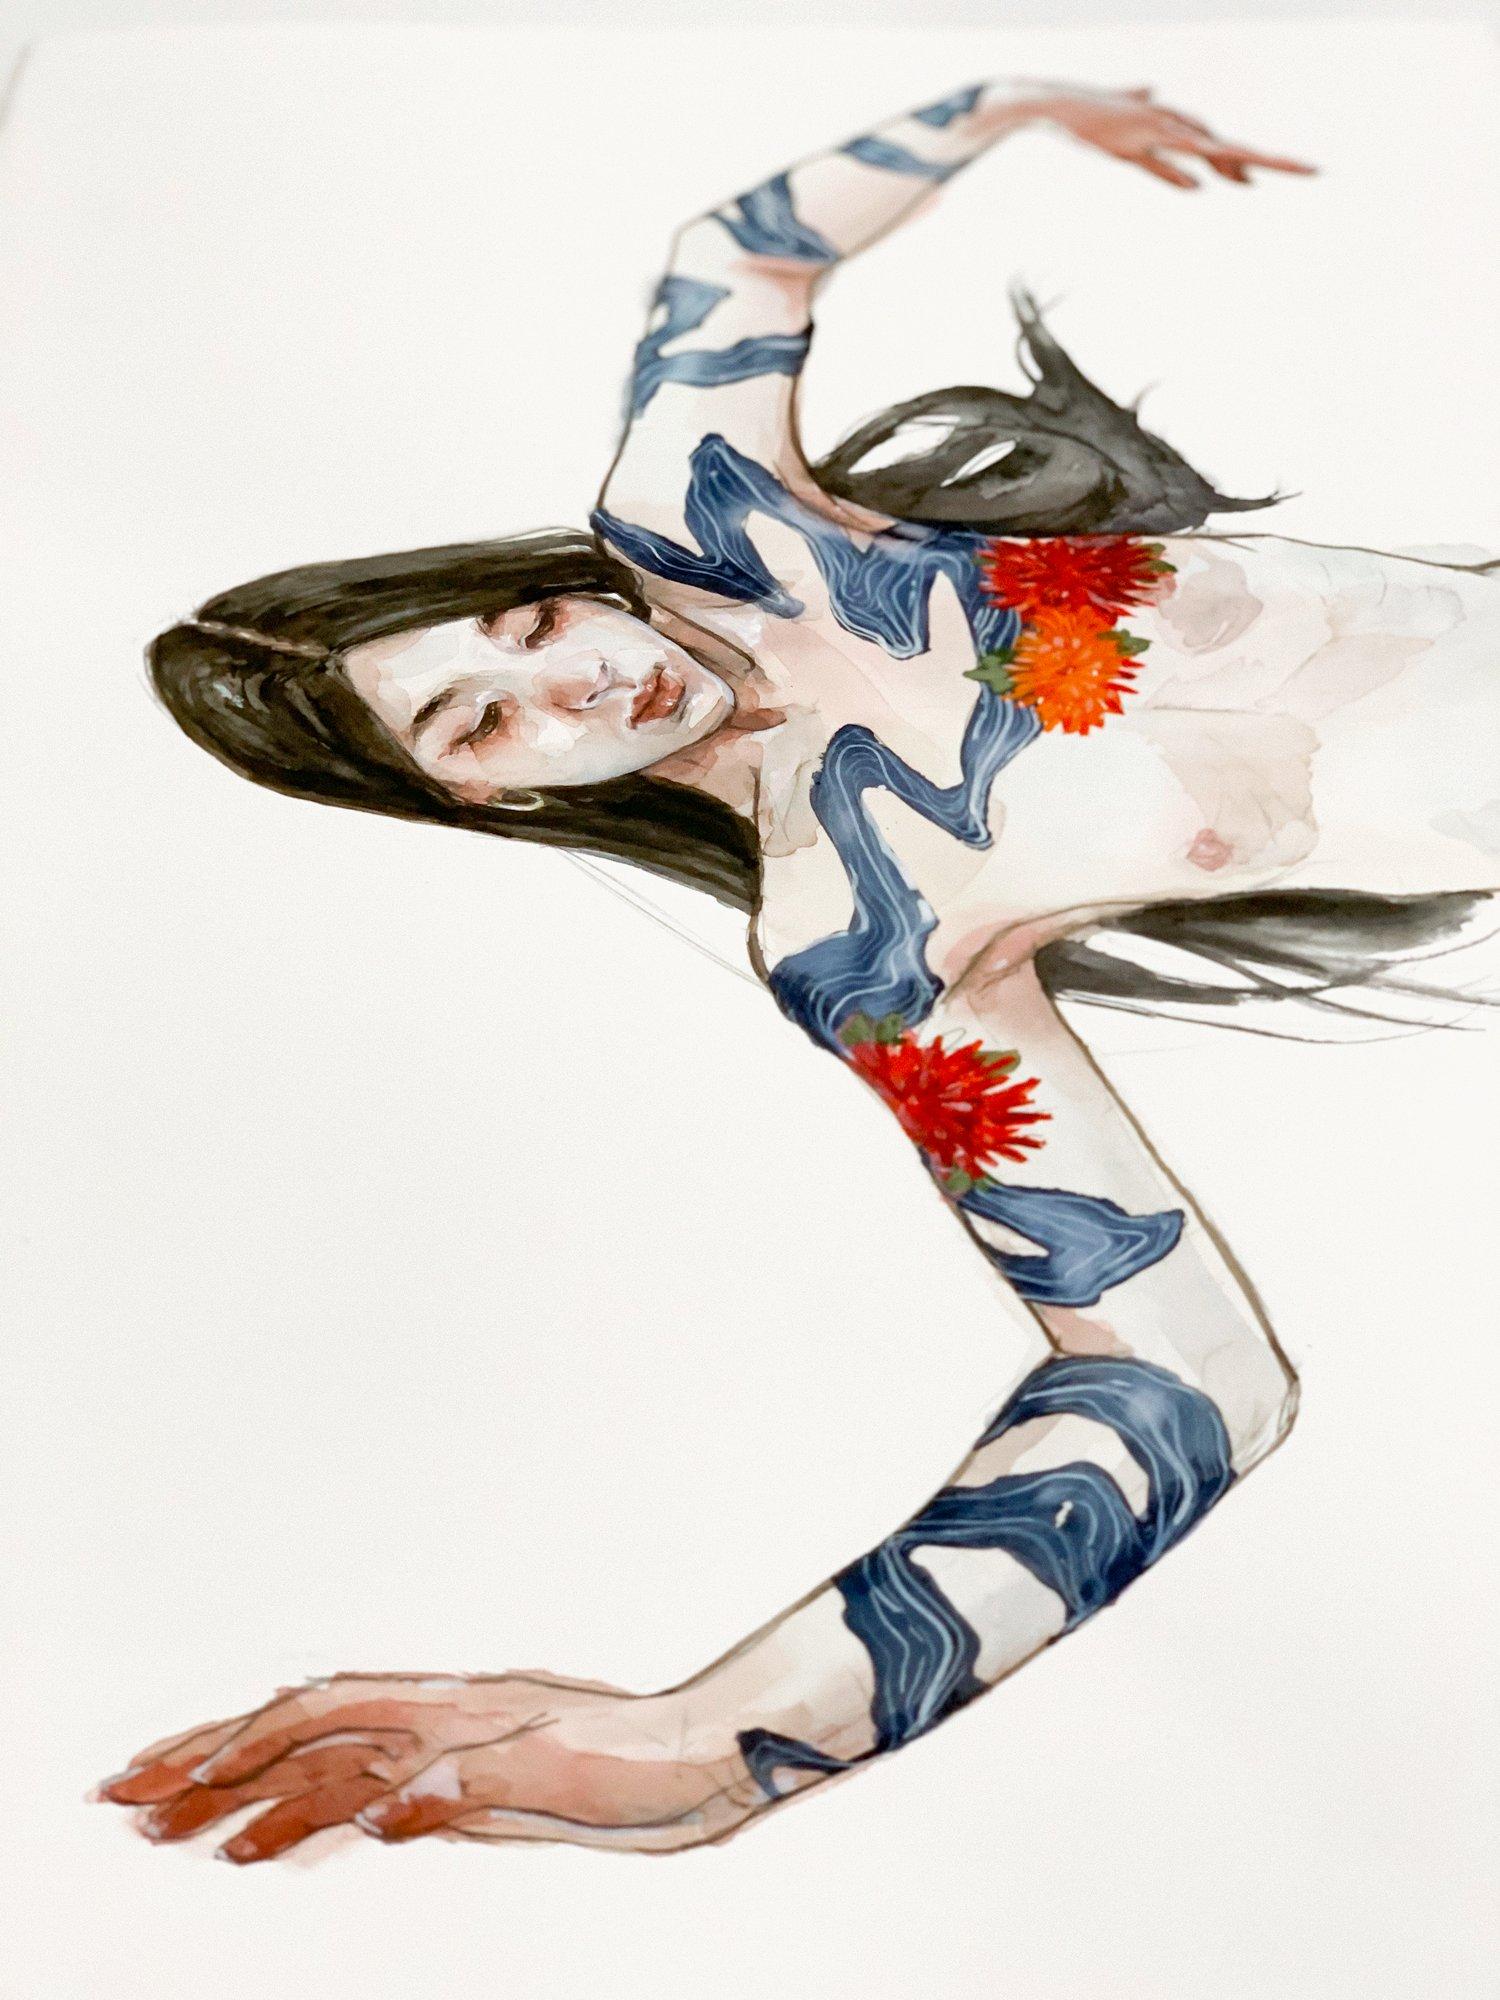 Agnes-Cecile mood: the river